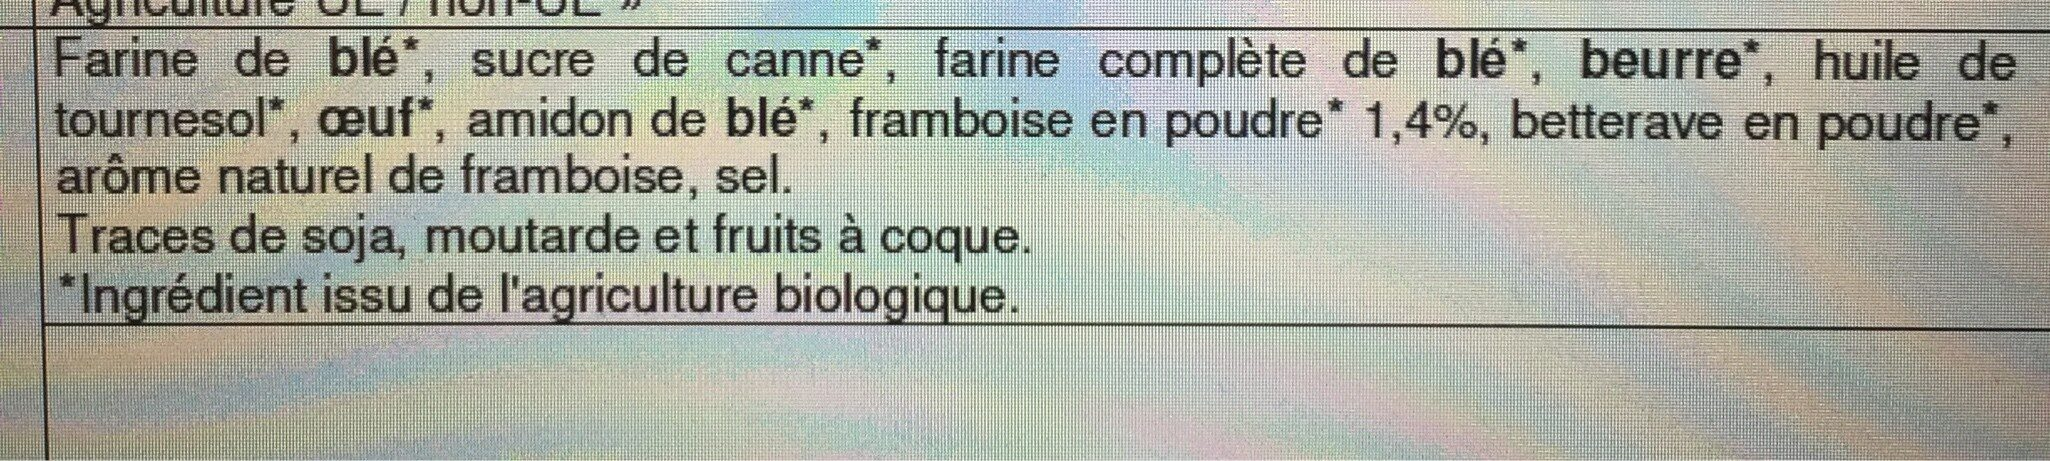 Essai framboise - Ingredients - fr